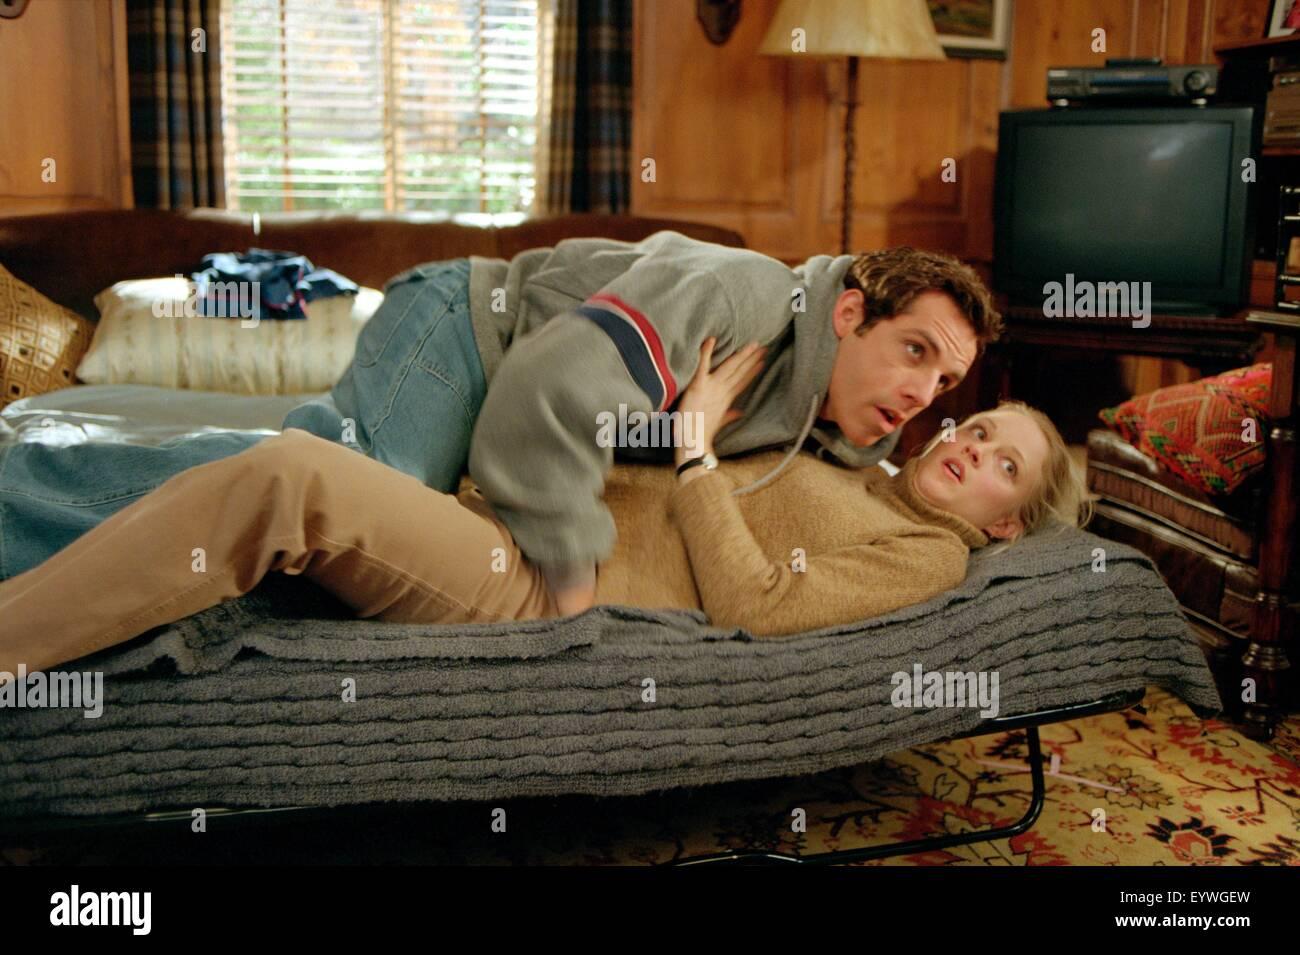 Meet the Parents ; Year : 2000 USA ; Director : Jay Roach ; Ben Stiller, Teri Polo ; Photo: Phillip V. Caruso - Stock Image